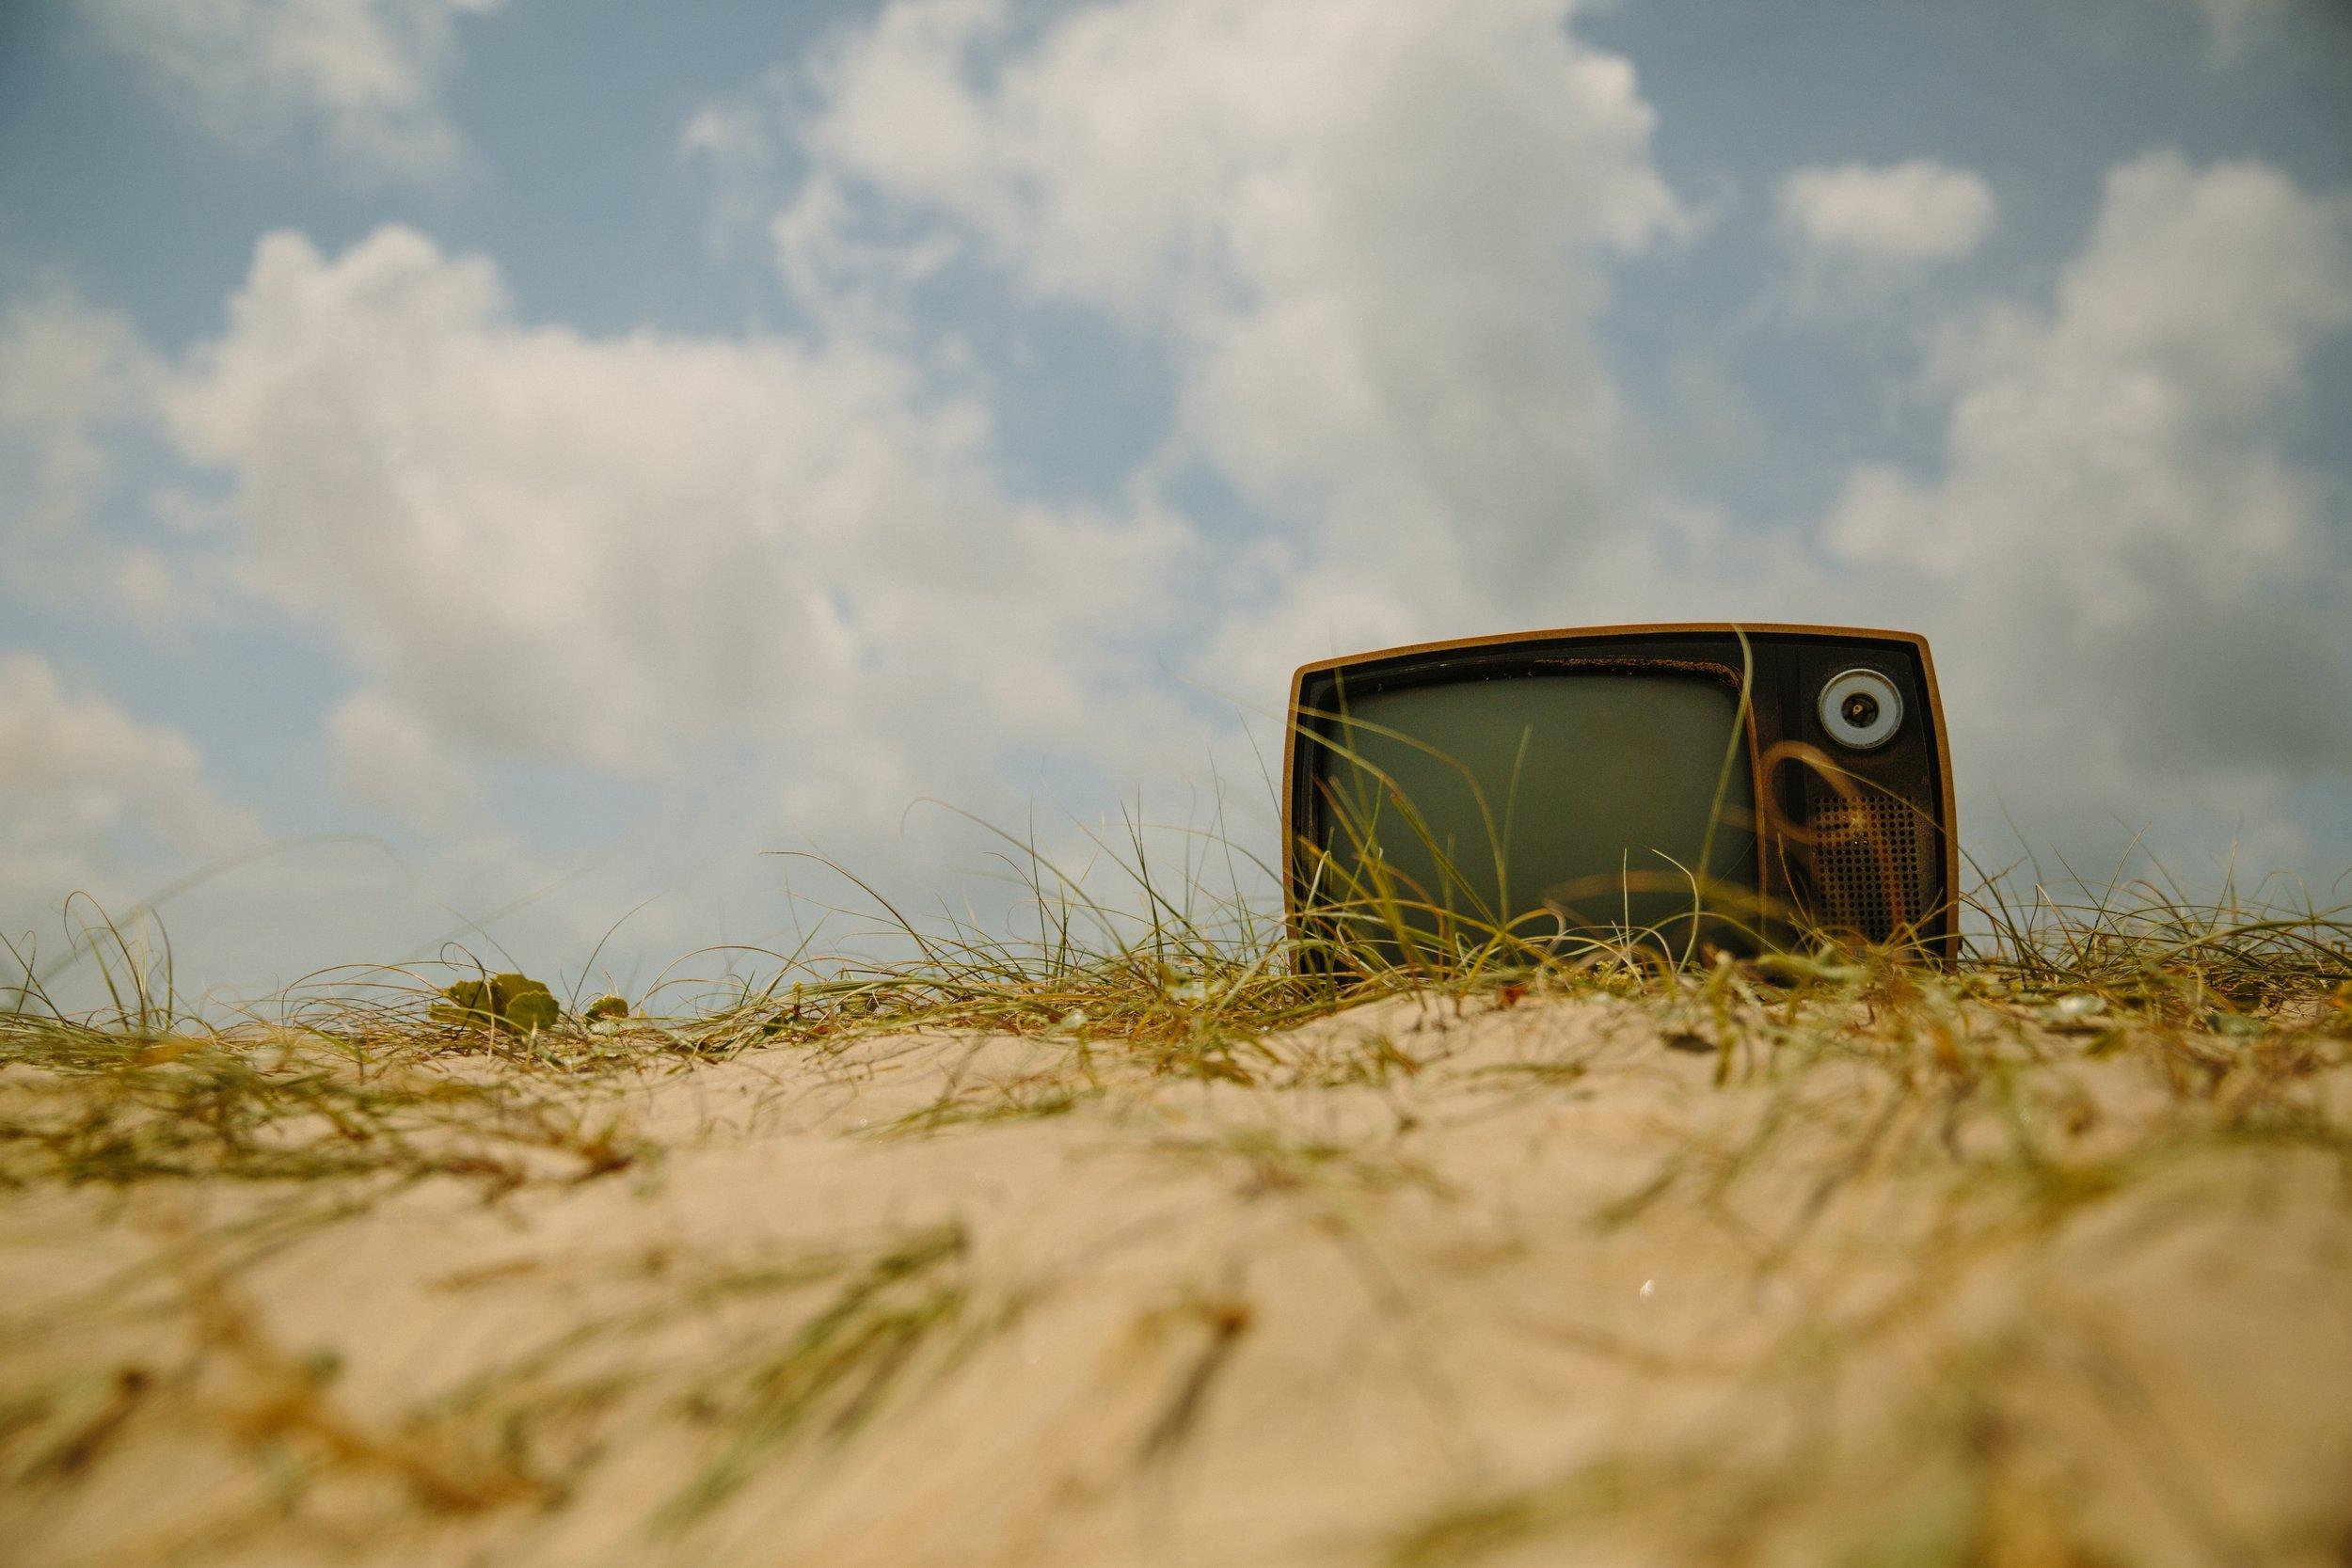 uwm.sleep.tv.landscape-grass-sand-cloud-sky-field-14228-pxhere.com